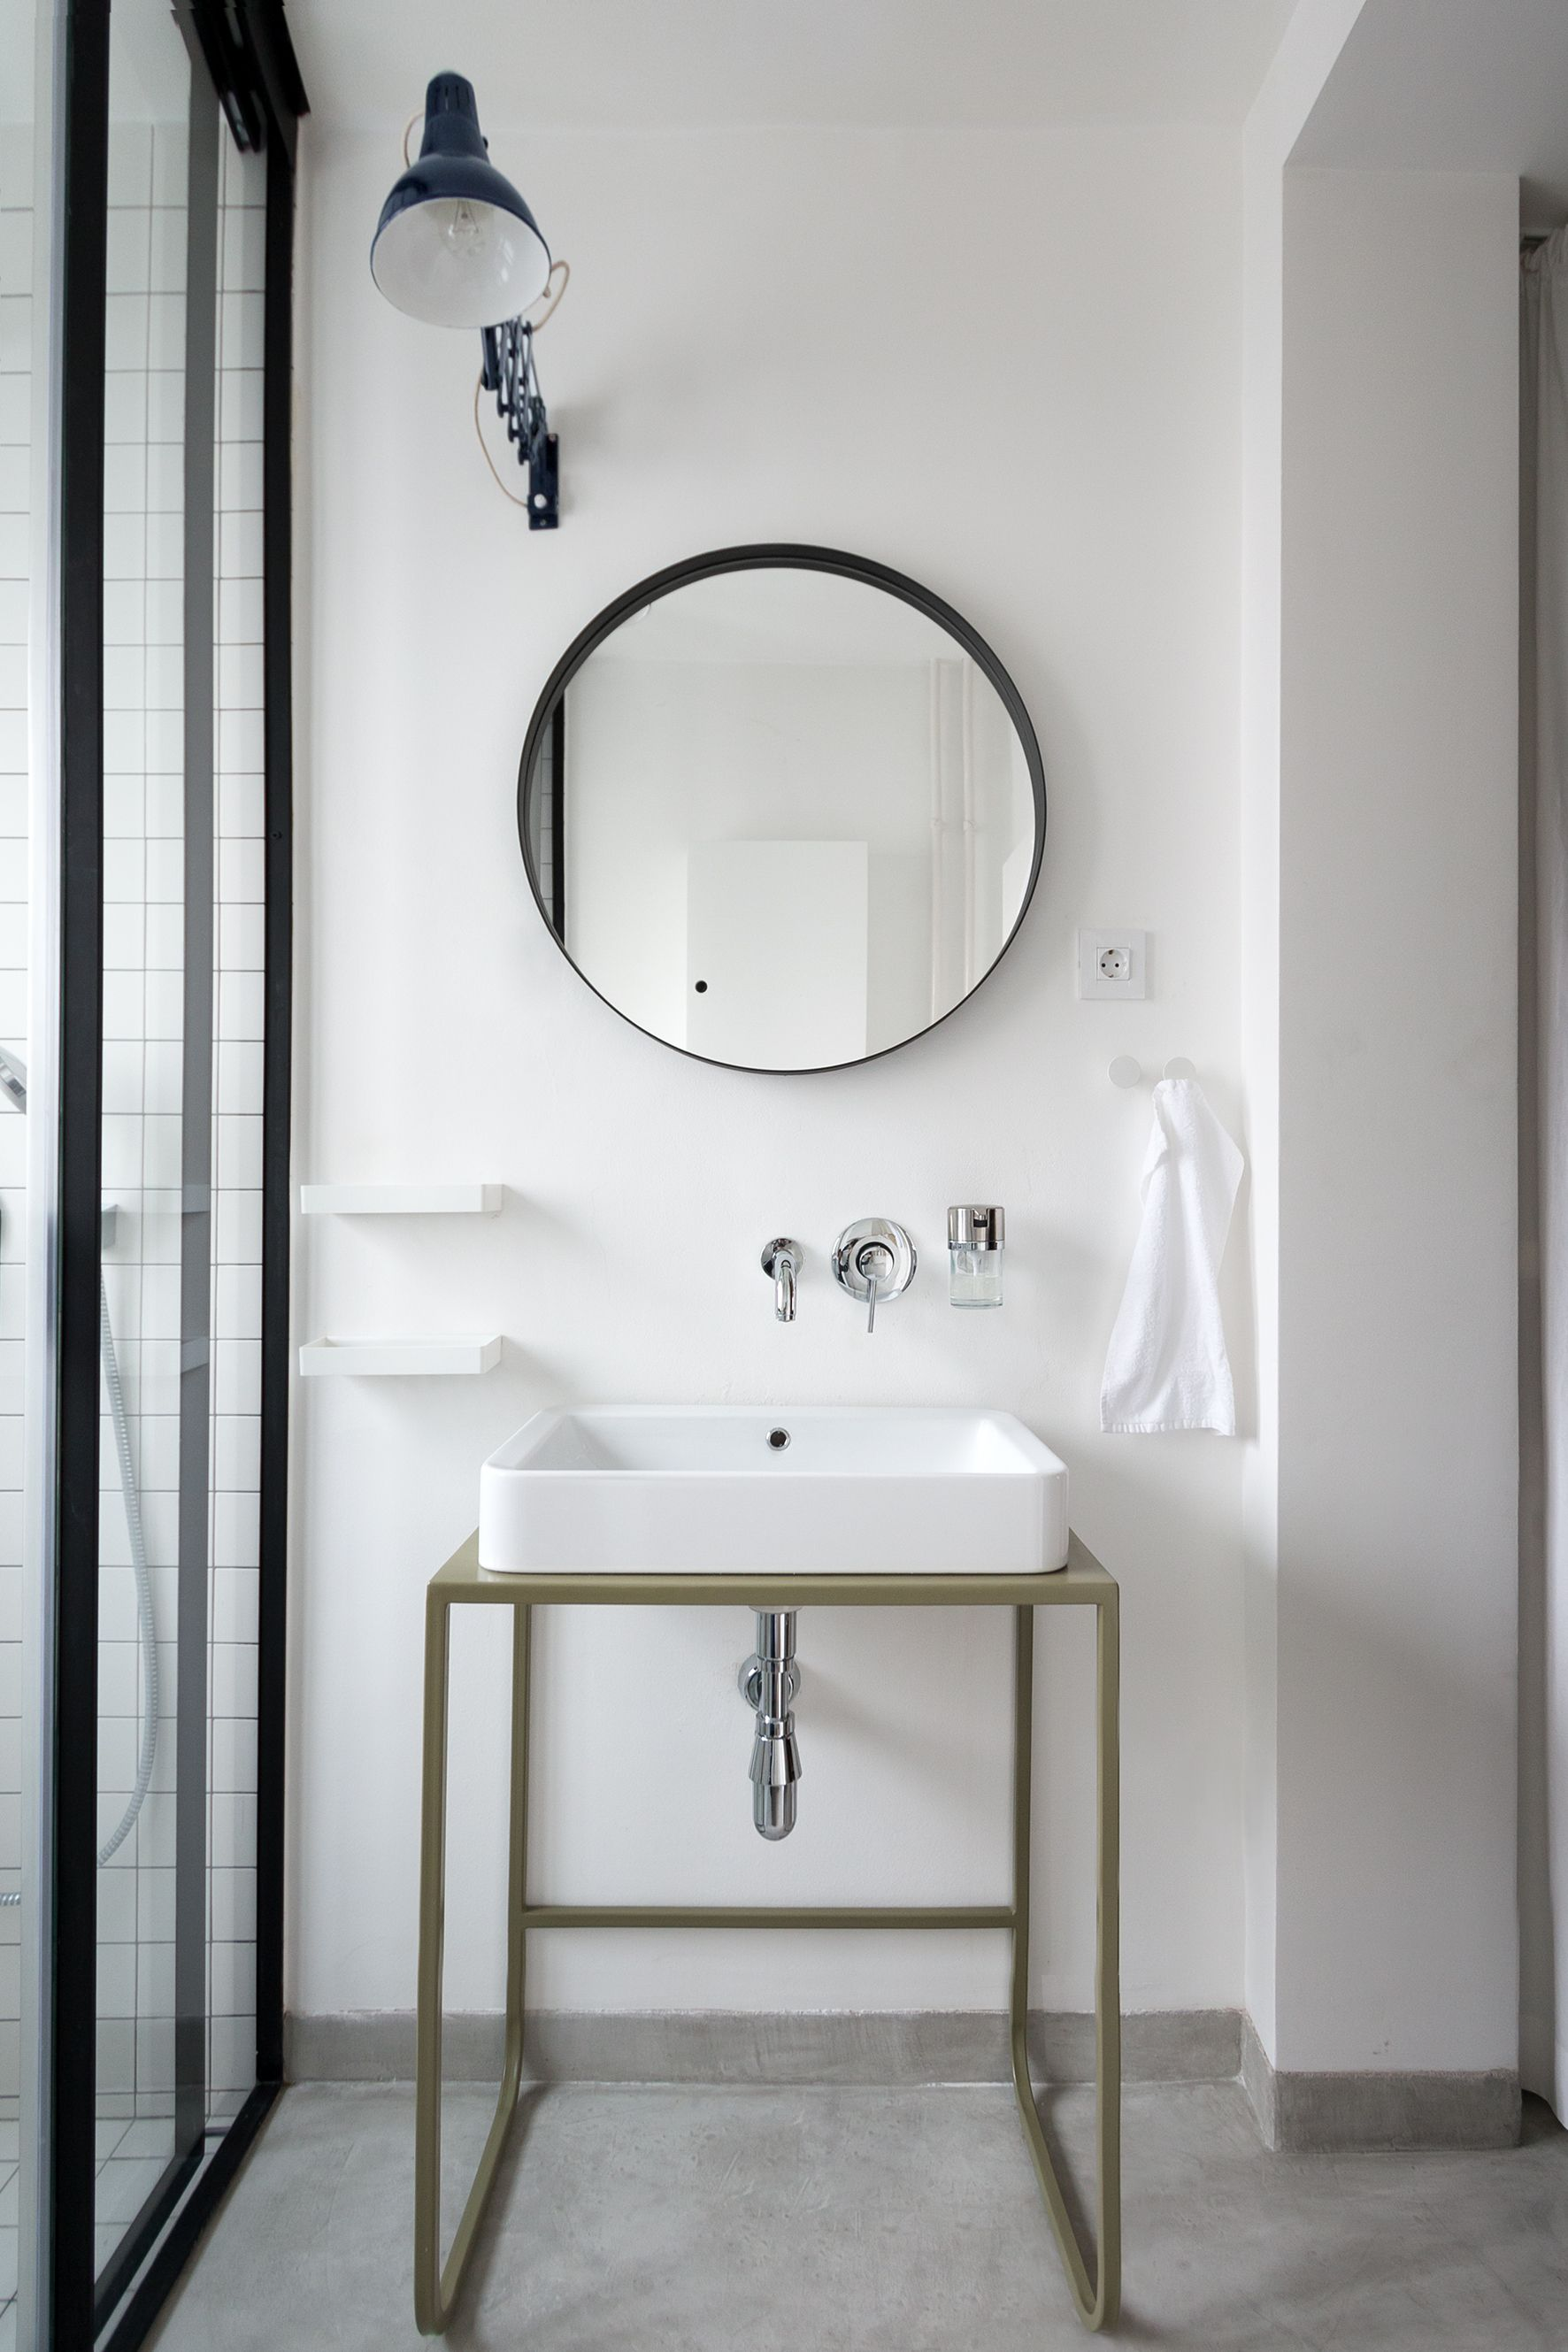 Dom Katarine | Interiors, Bath and Sinks